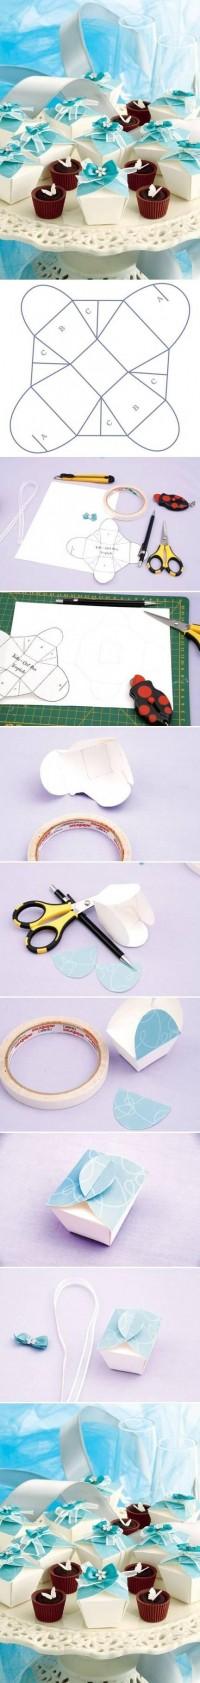 DIY Simple Nice Gift Box DIY Projects | UsefulDIY.com